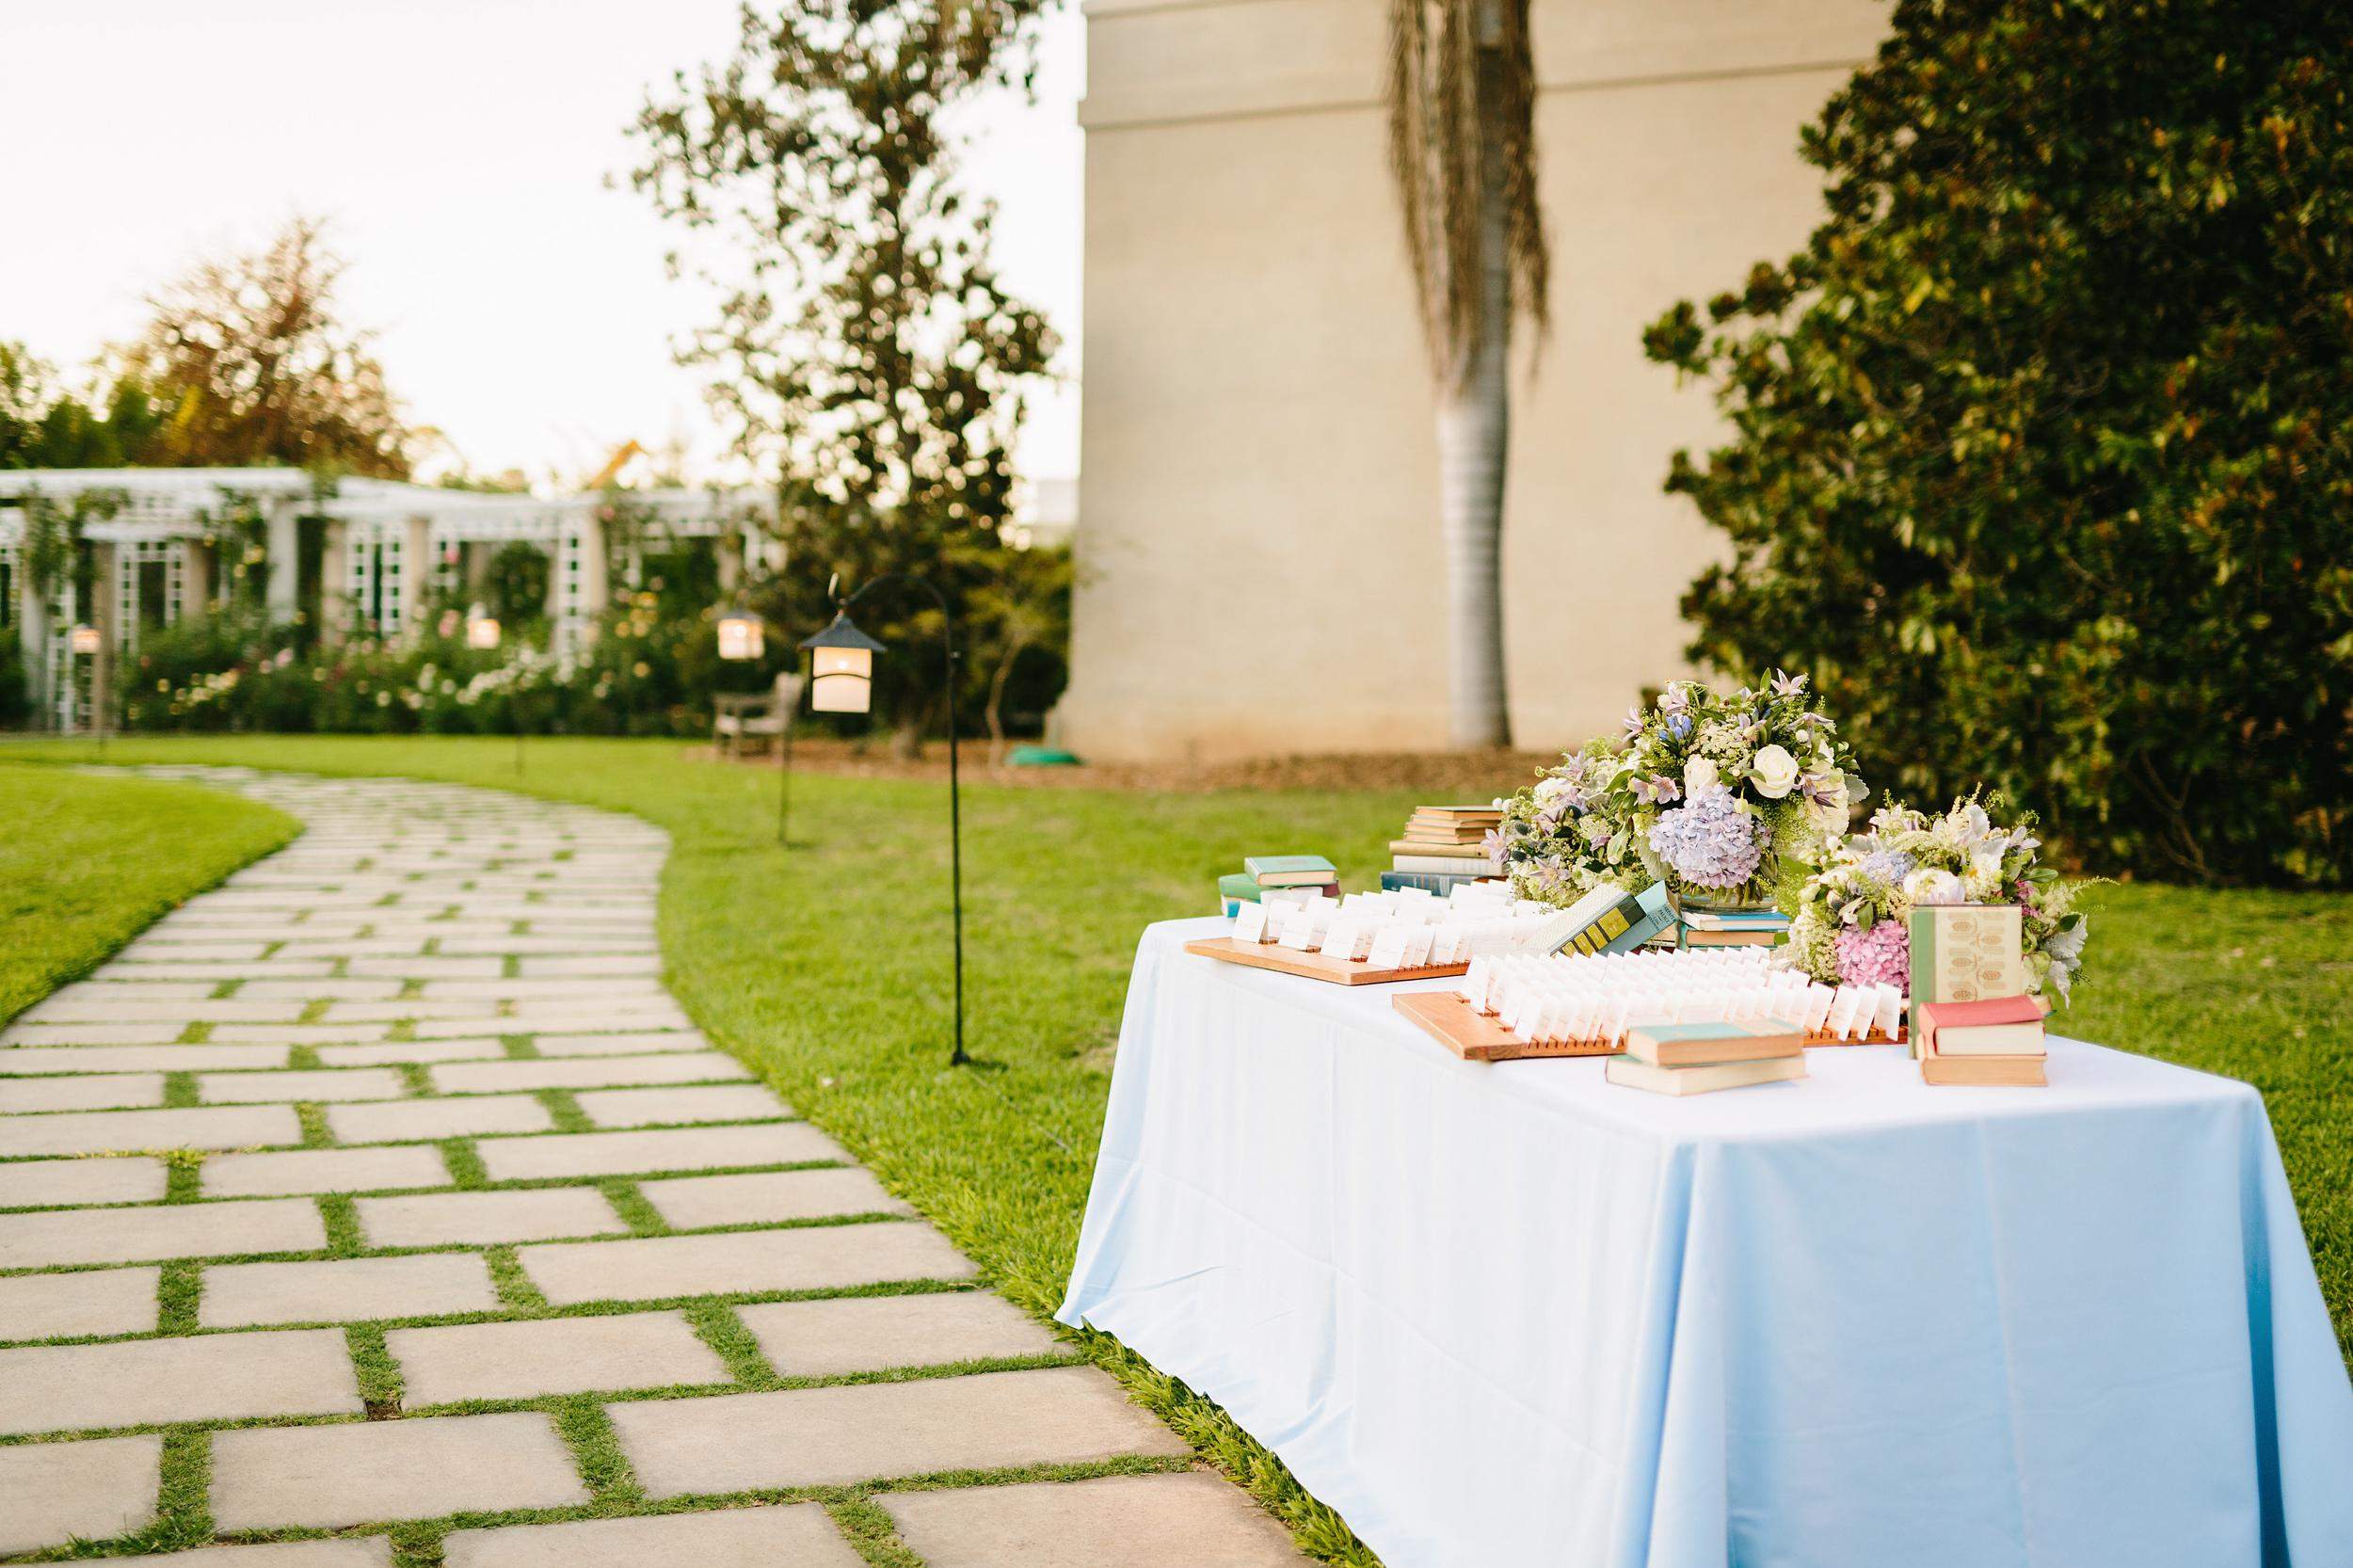 huntington-library-wedding-HP-19.jpg